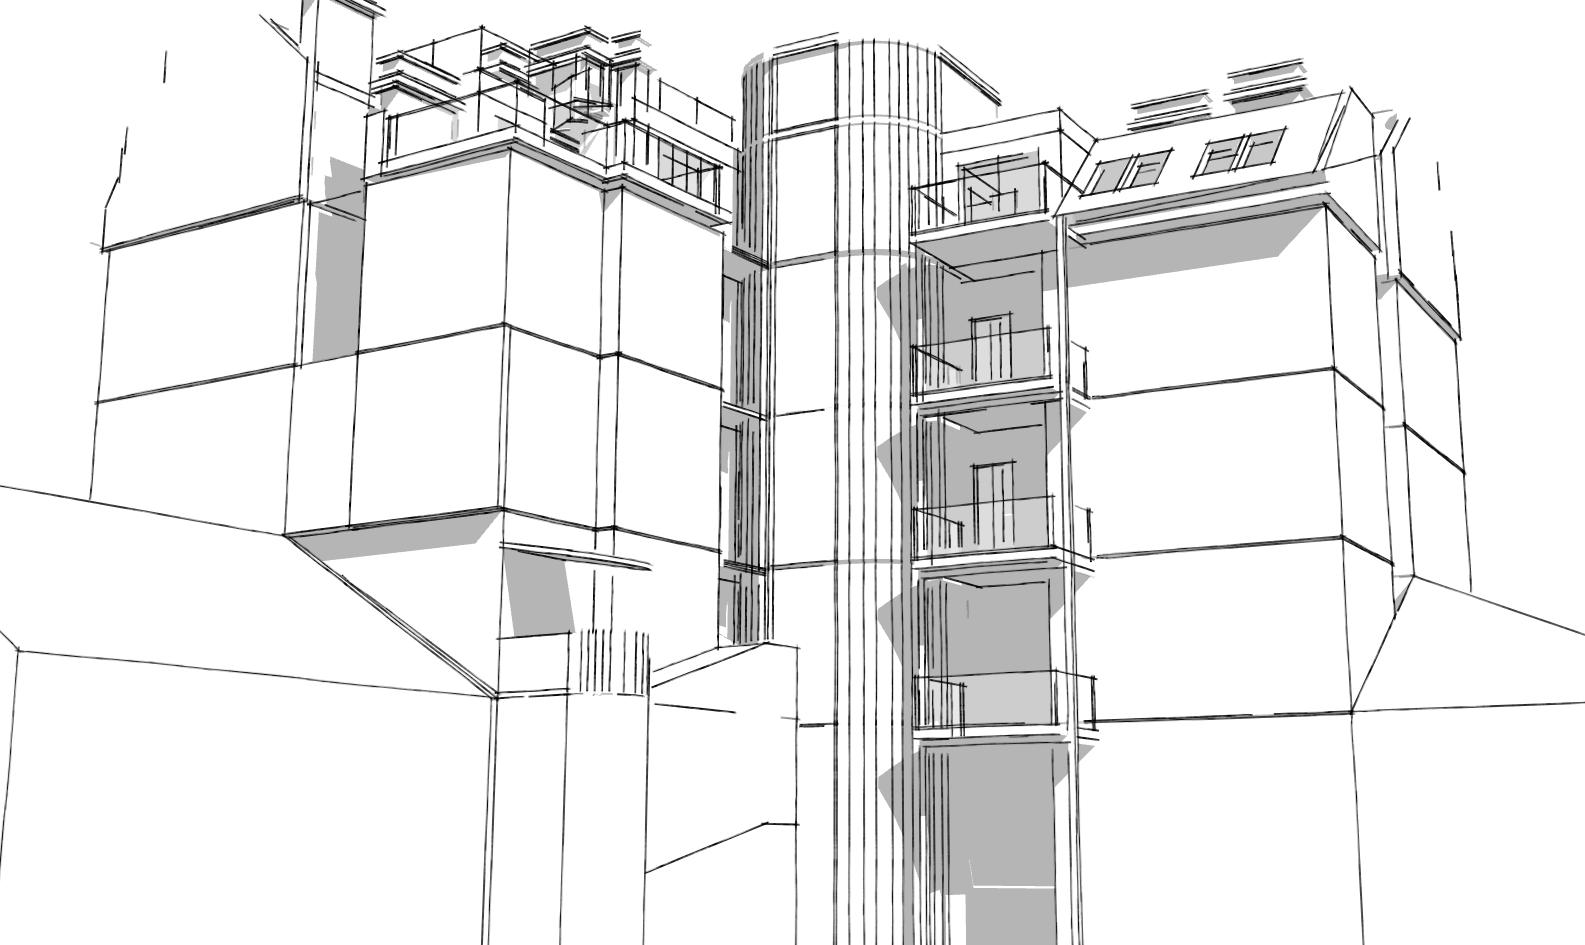 08_entwurf_architektur_rolandgasperl.at